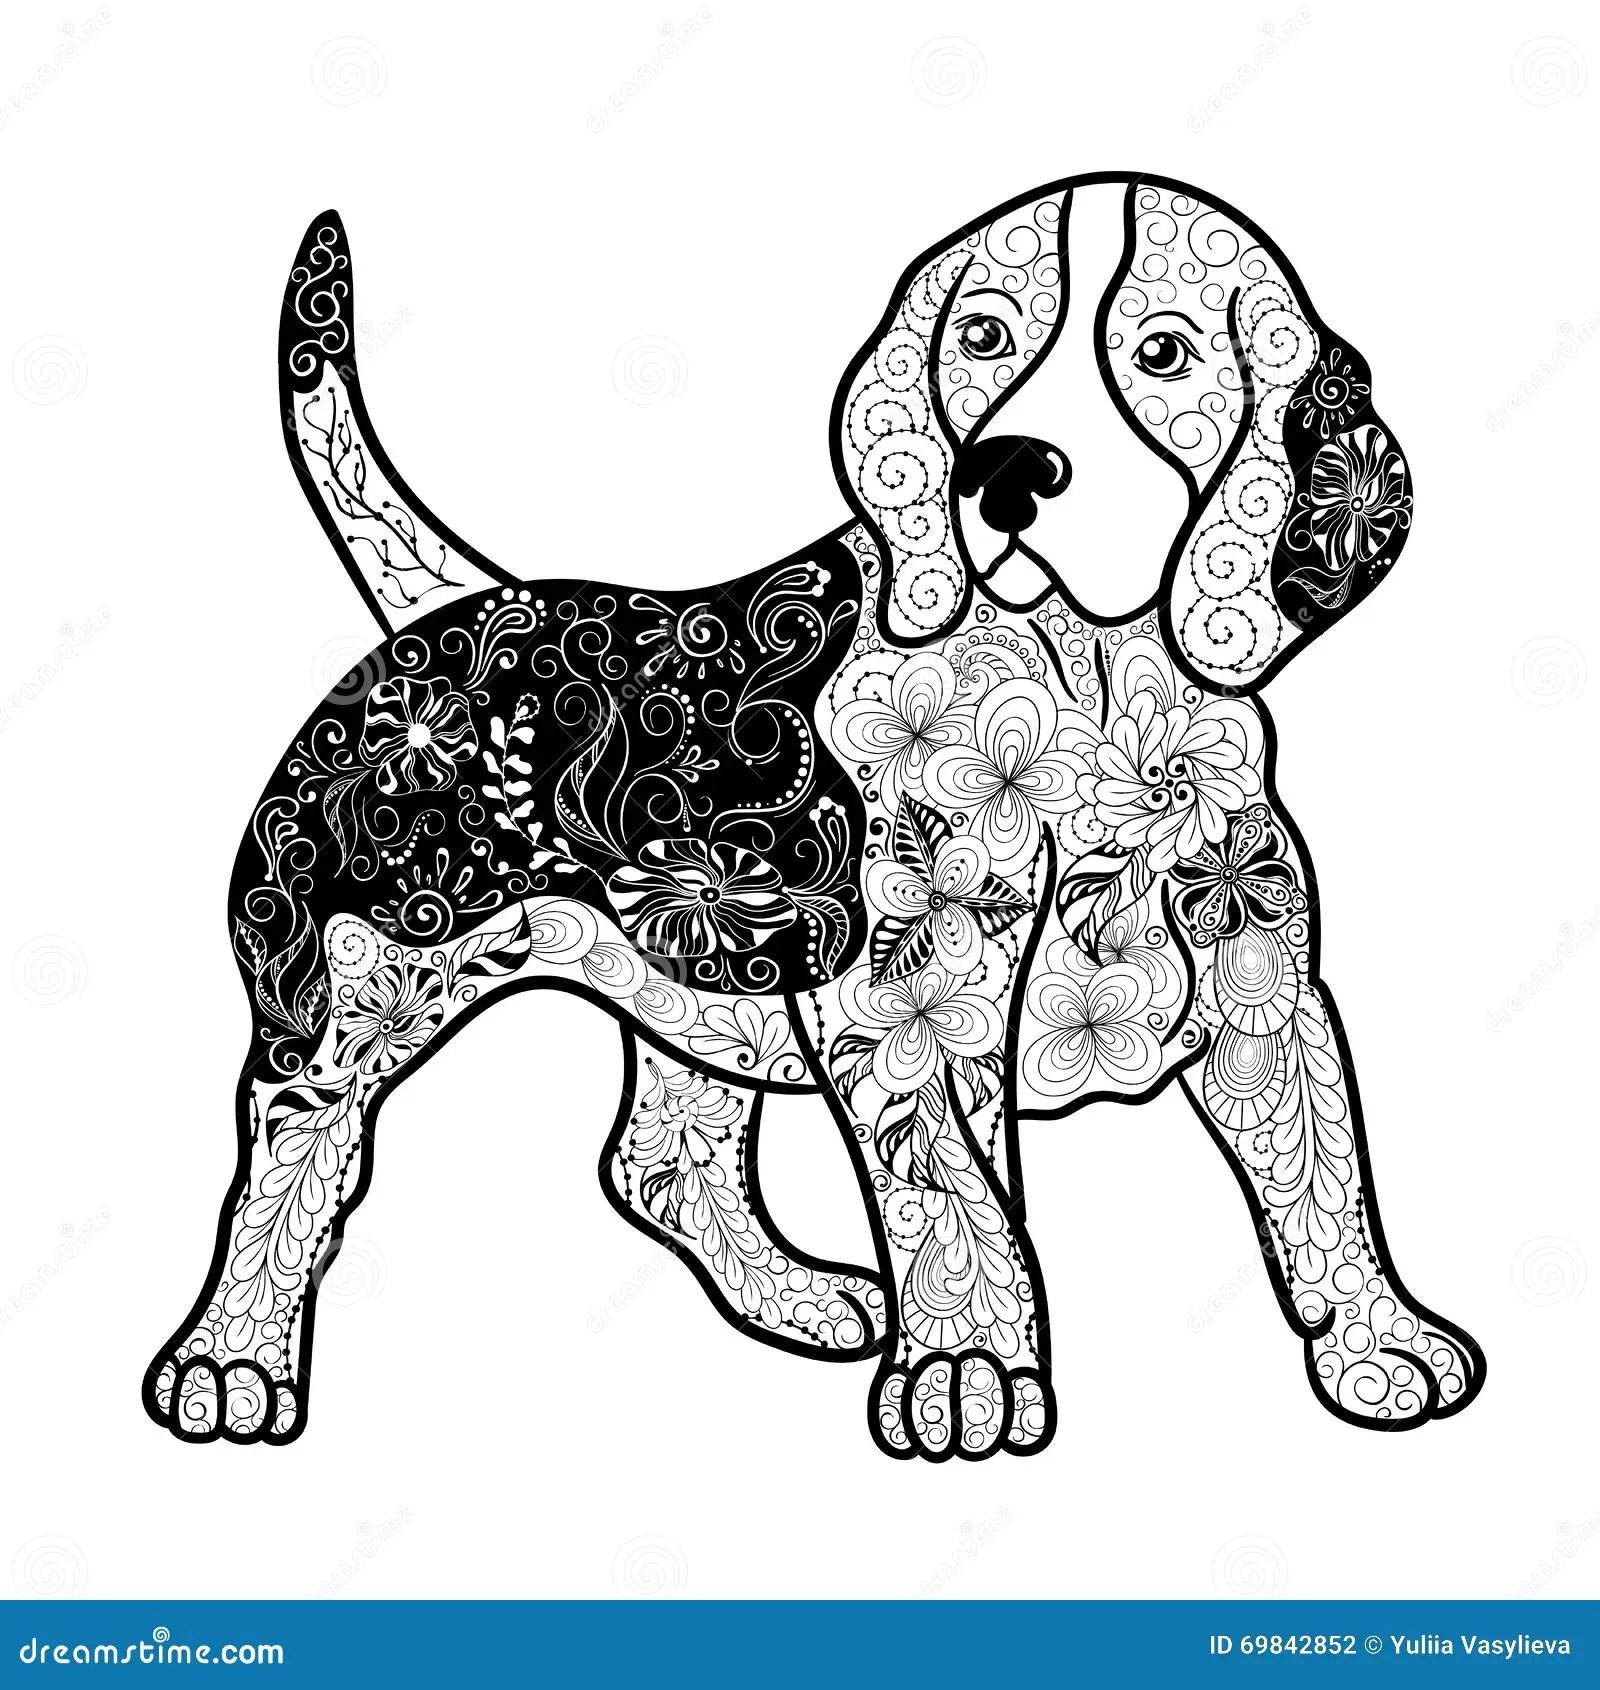 Beagle Dog Doodle Stock Vector Illustration Of Detailed